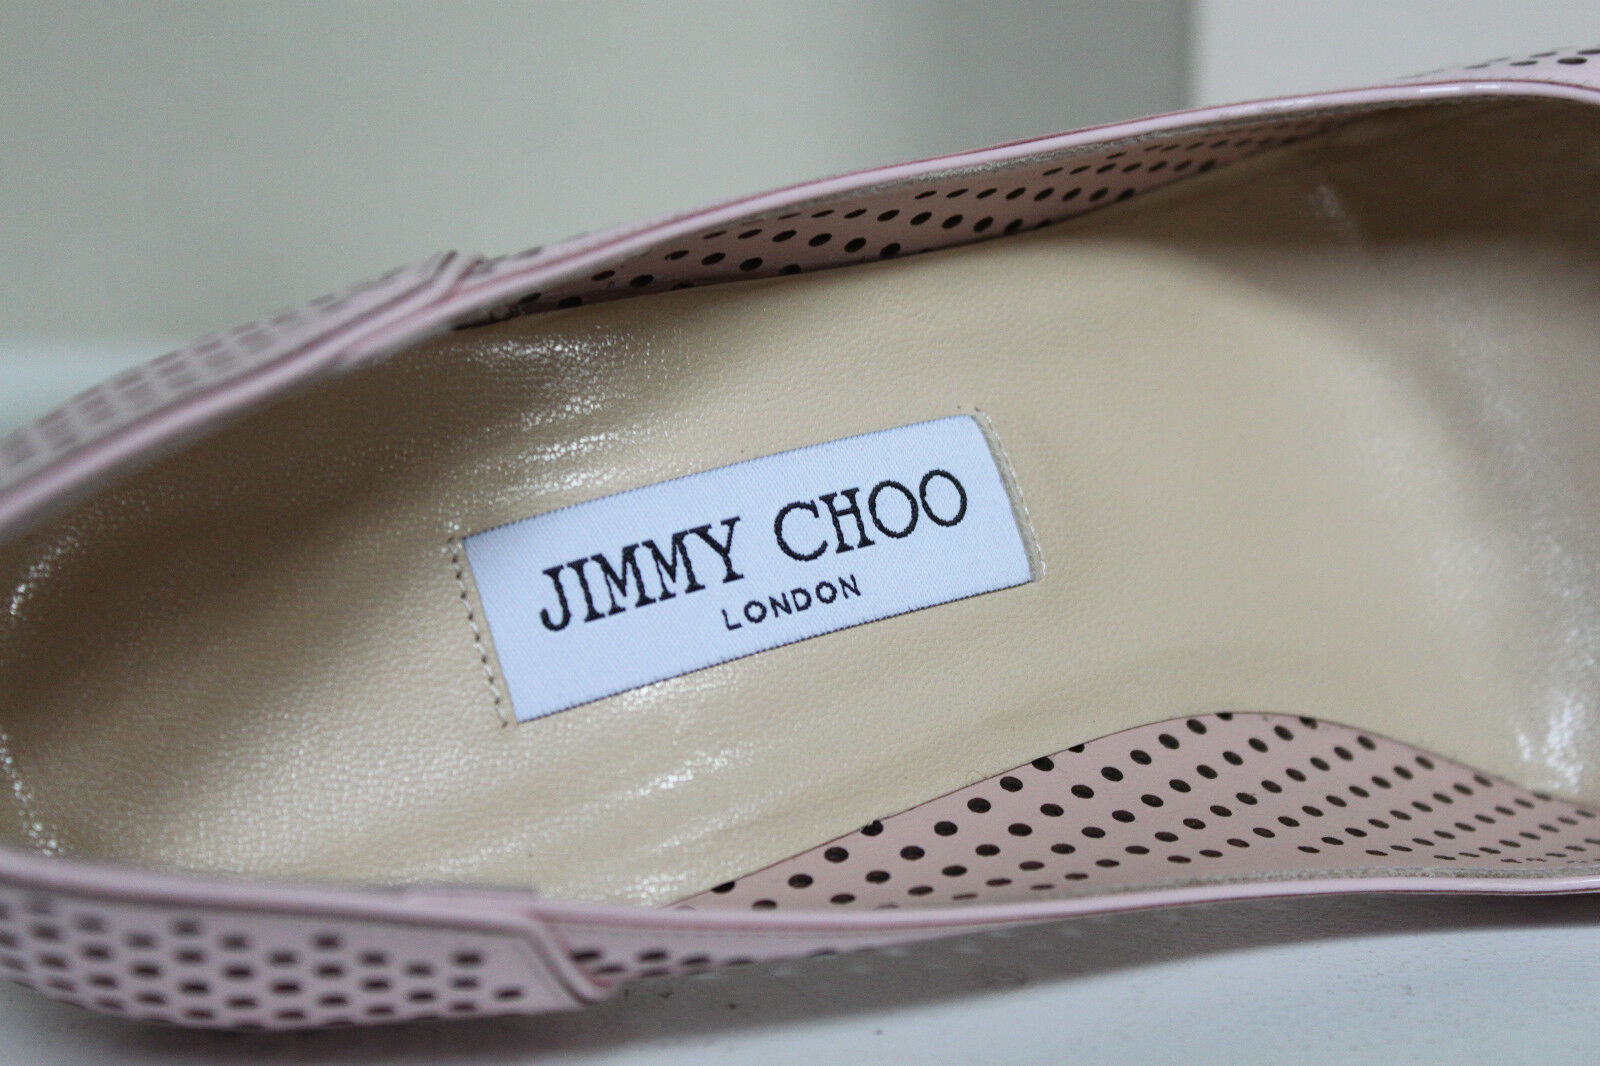 New sz 10 / 40 Jimmy Choo Abel Perforated Pink Pump Patent  Leder Classic Pump Pink schuhes 1193f2